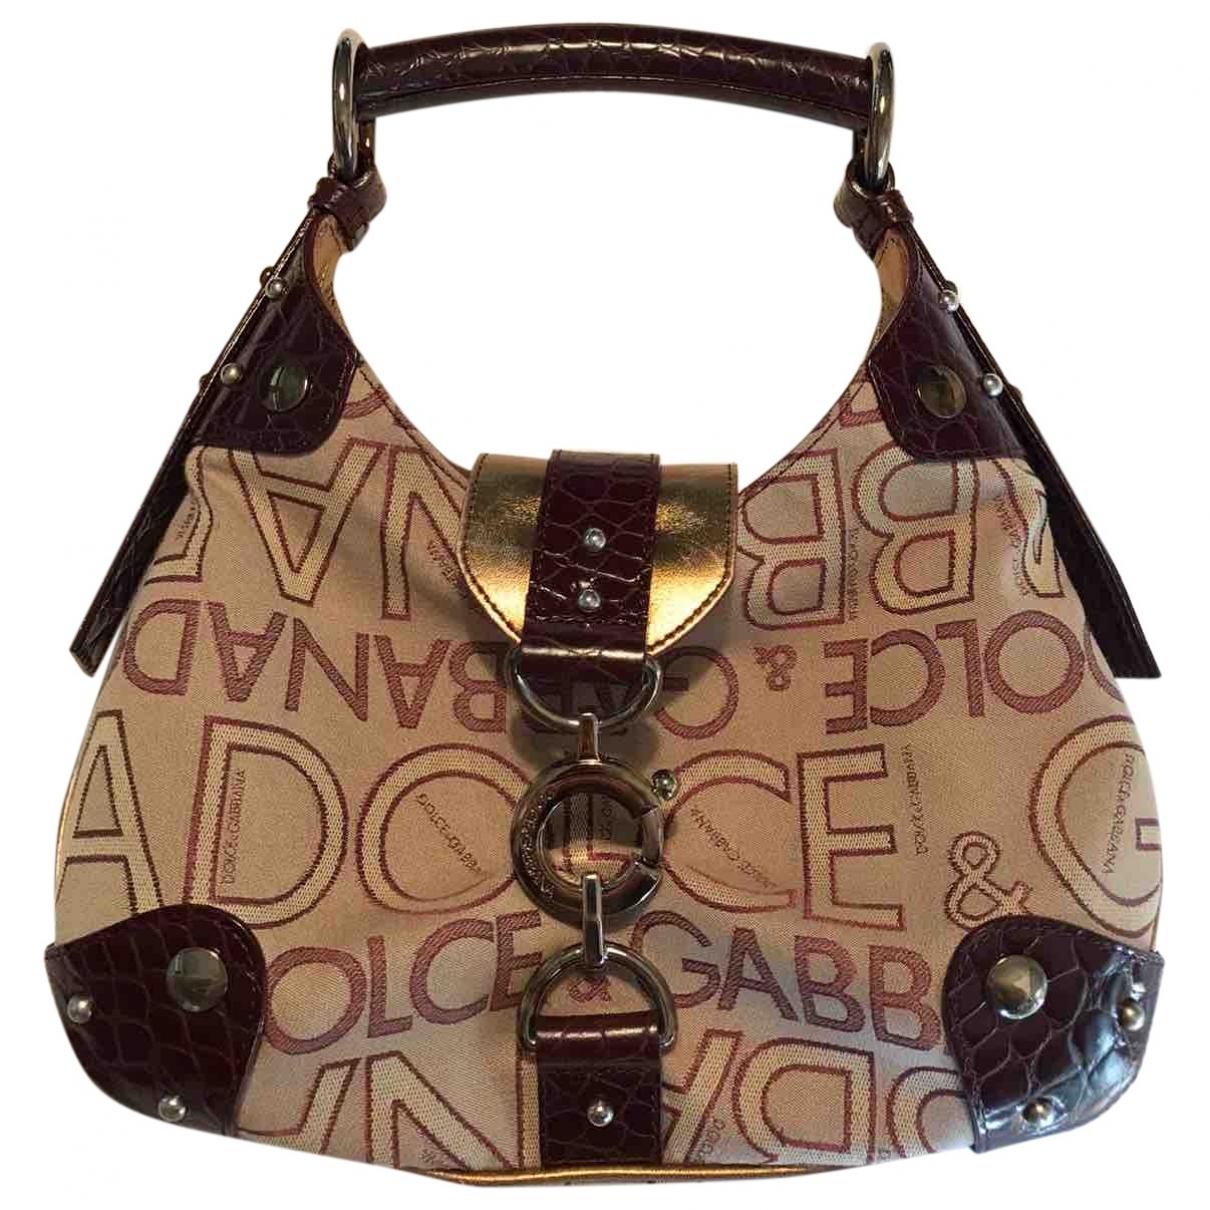 Dolce & Gabbana \N Handtasche in  Bordeauxrot Leinen